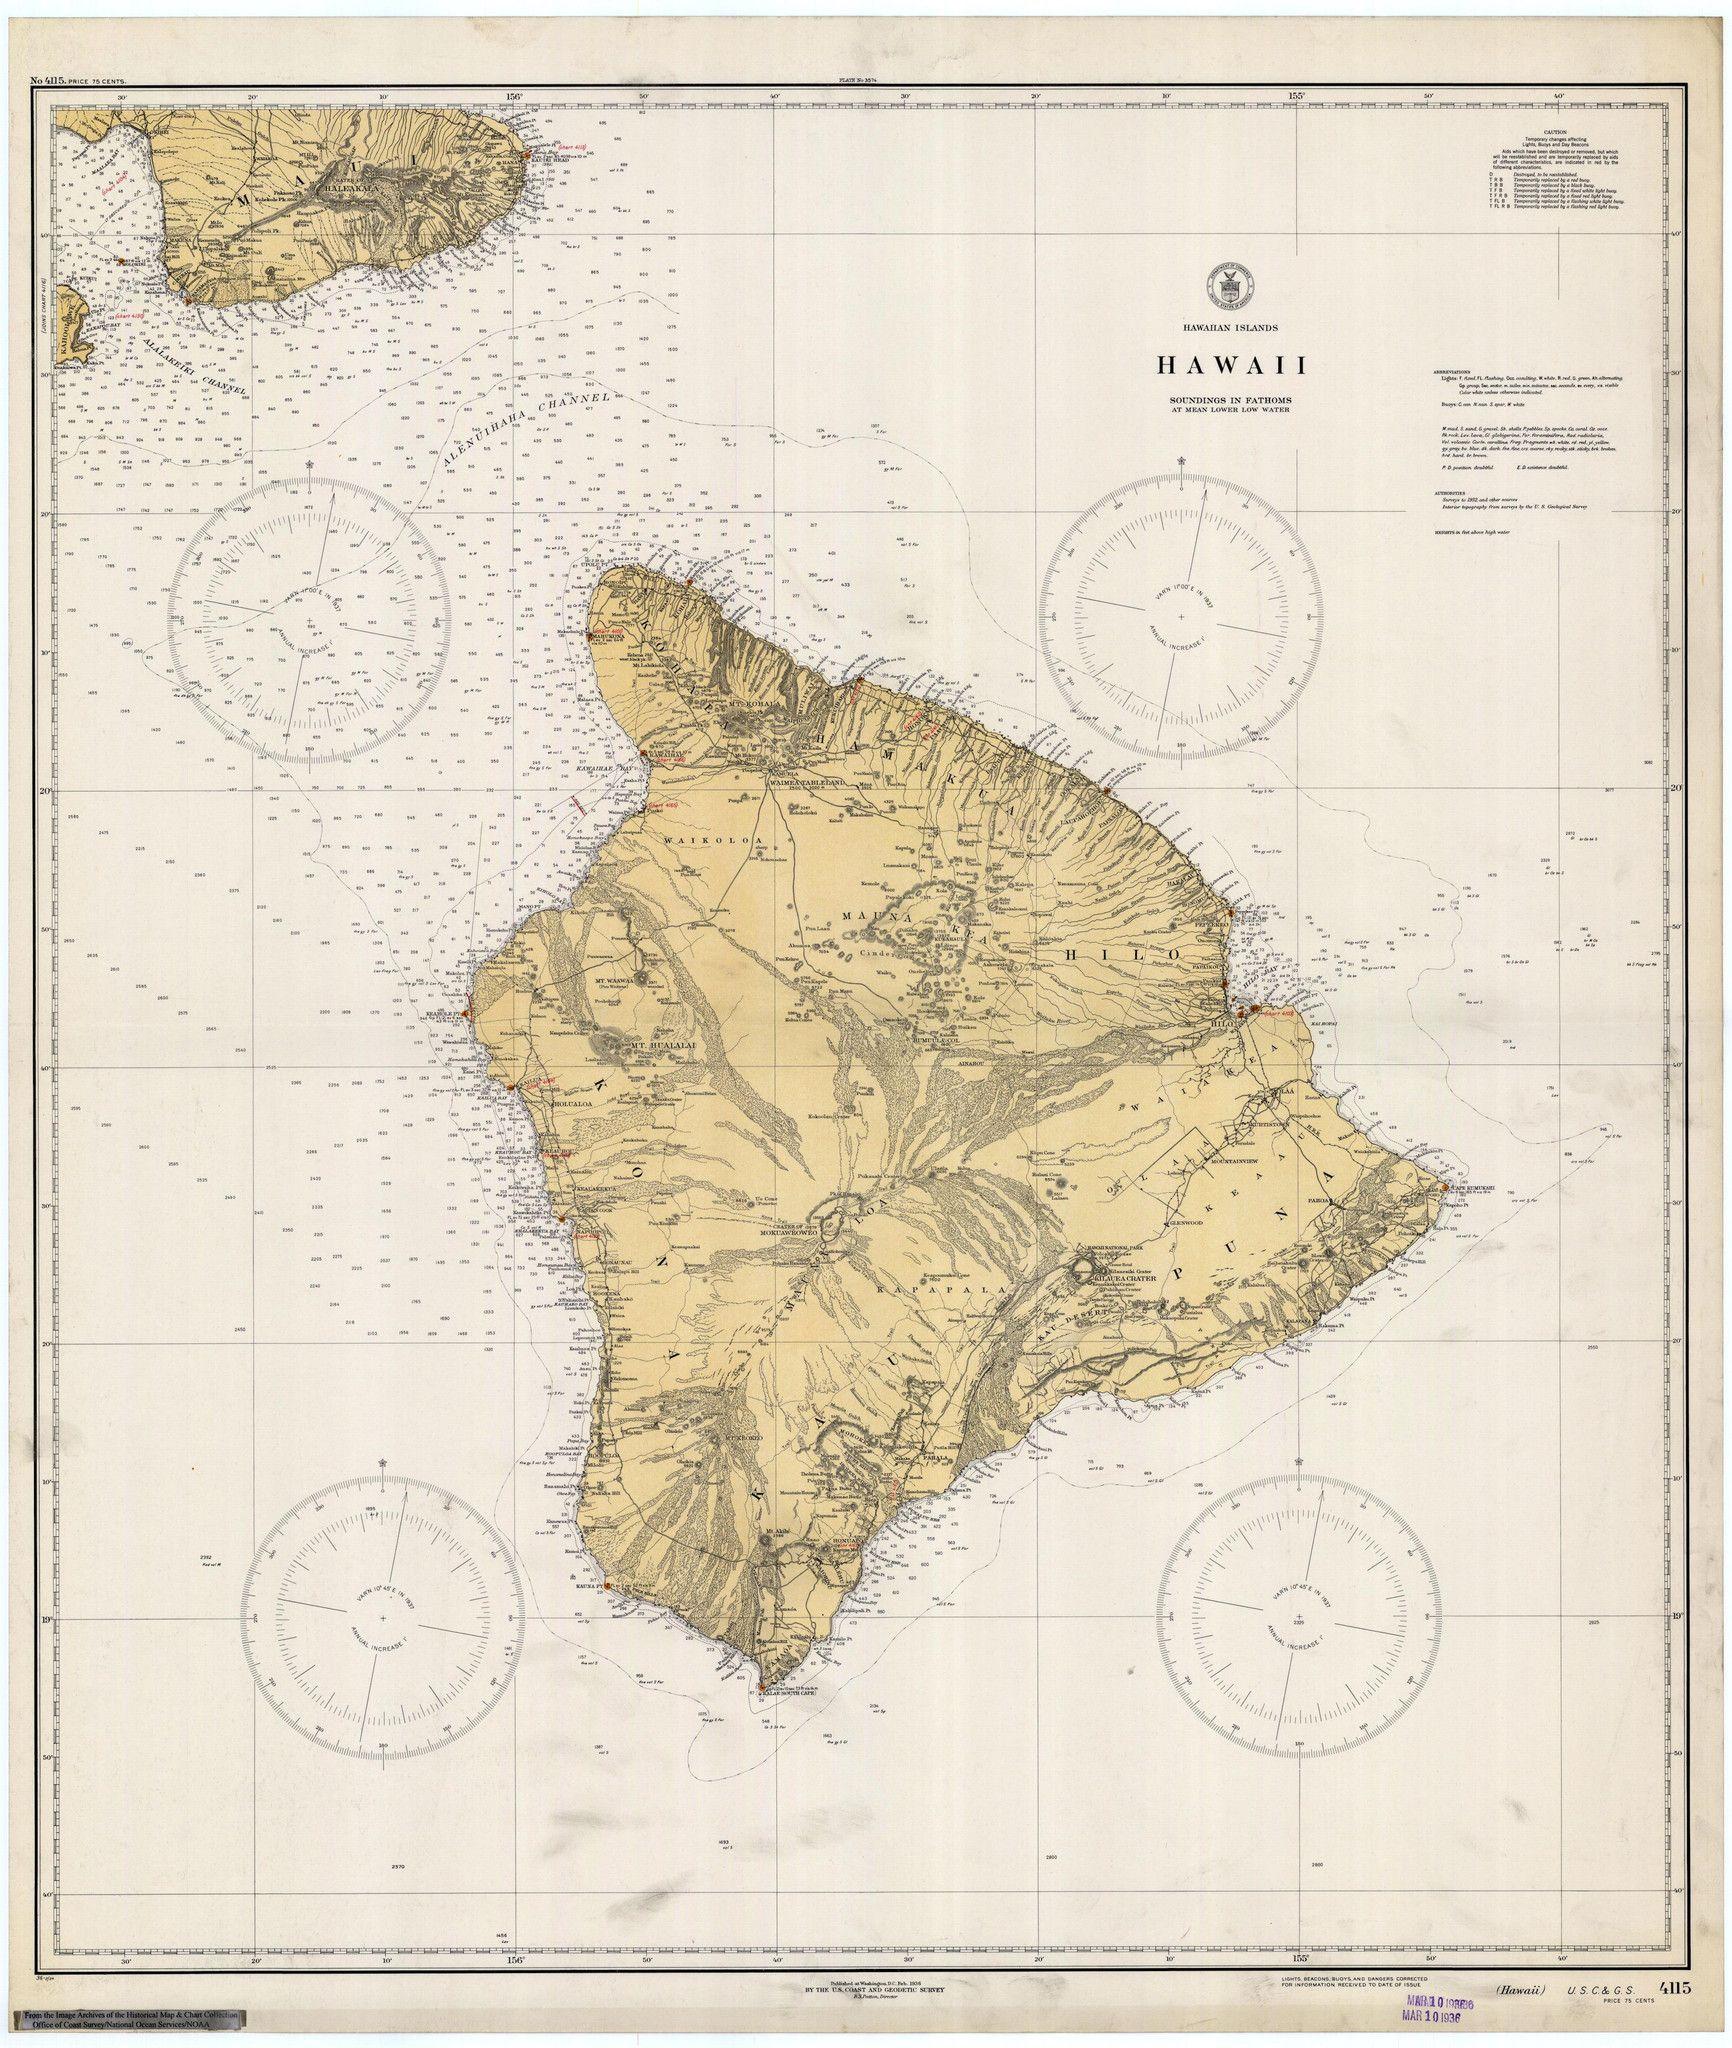 Uh Manoa Map Hawaii Historical Map 1936 U S Hawaii Vintage Photographs